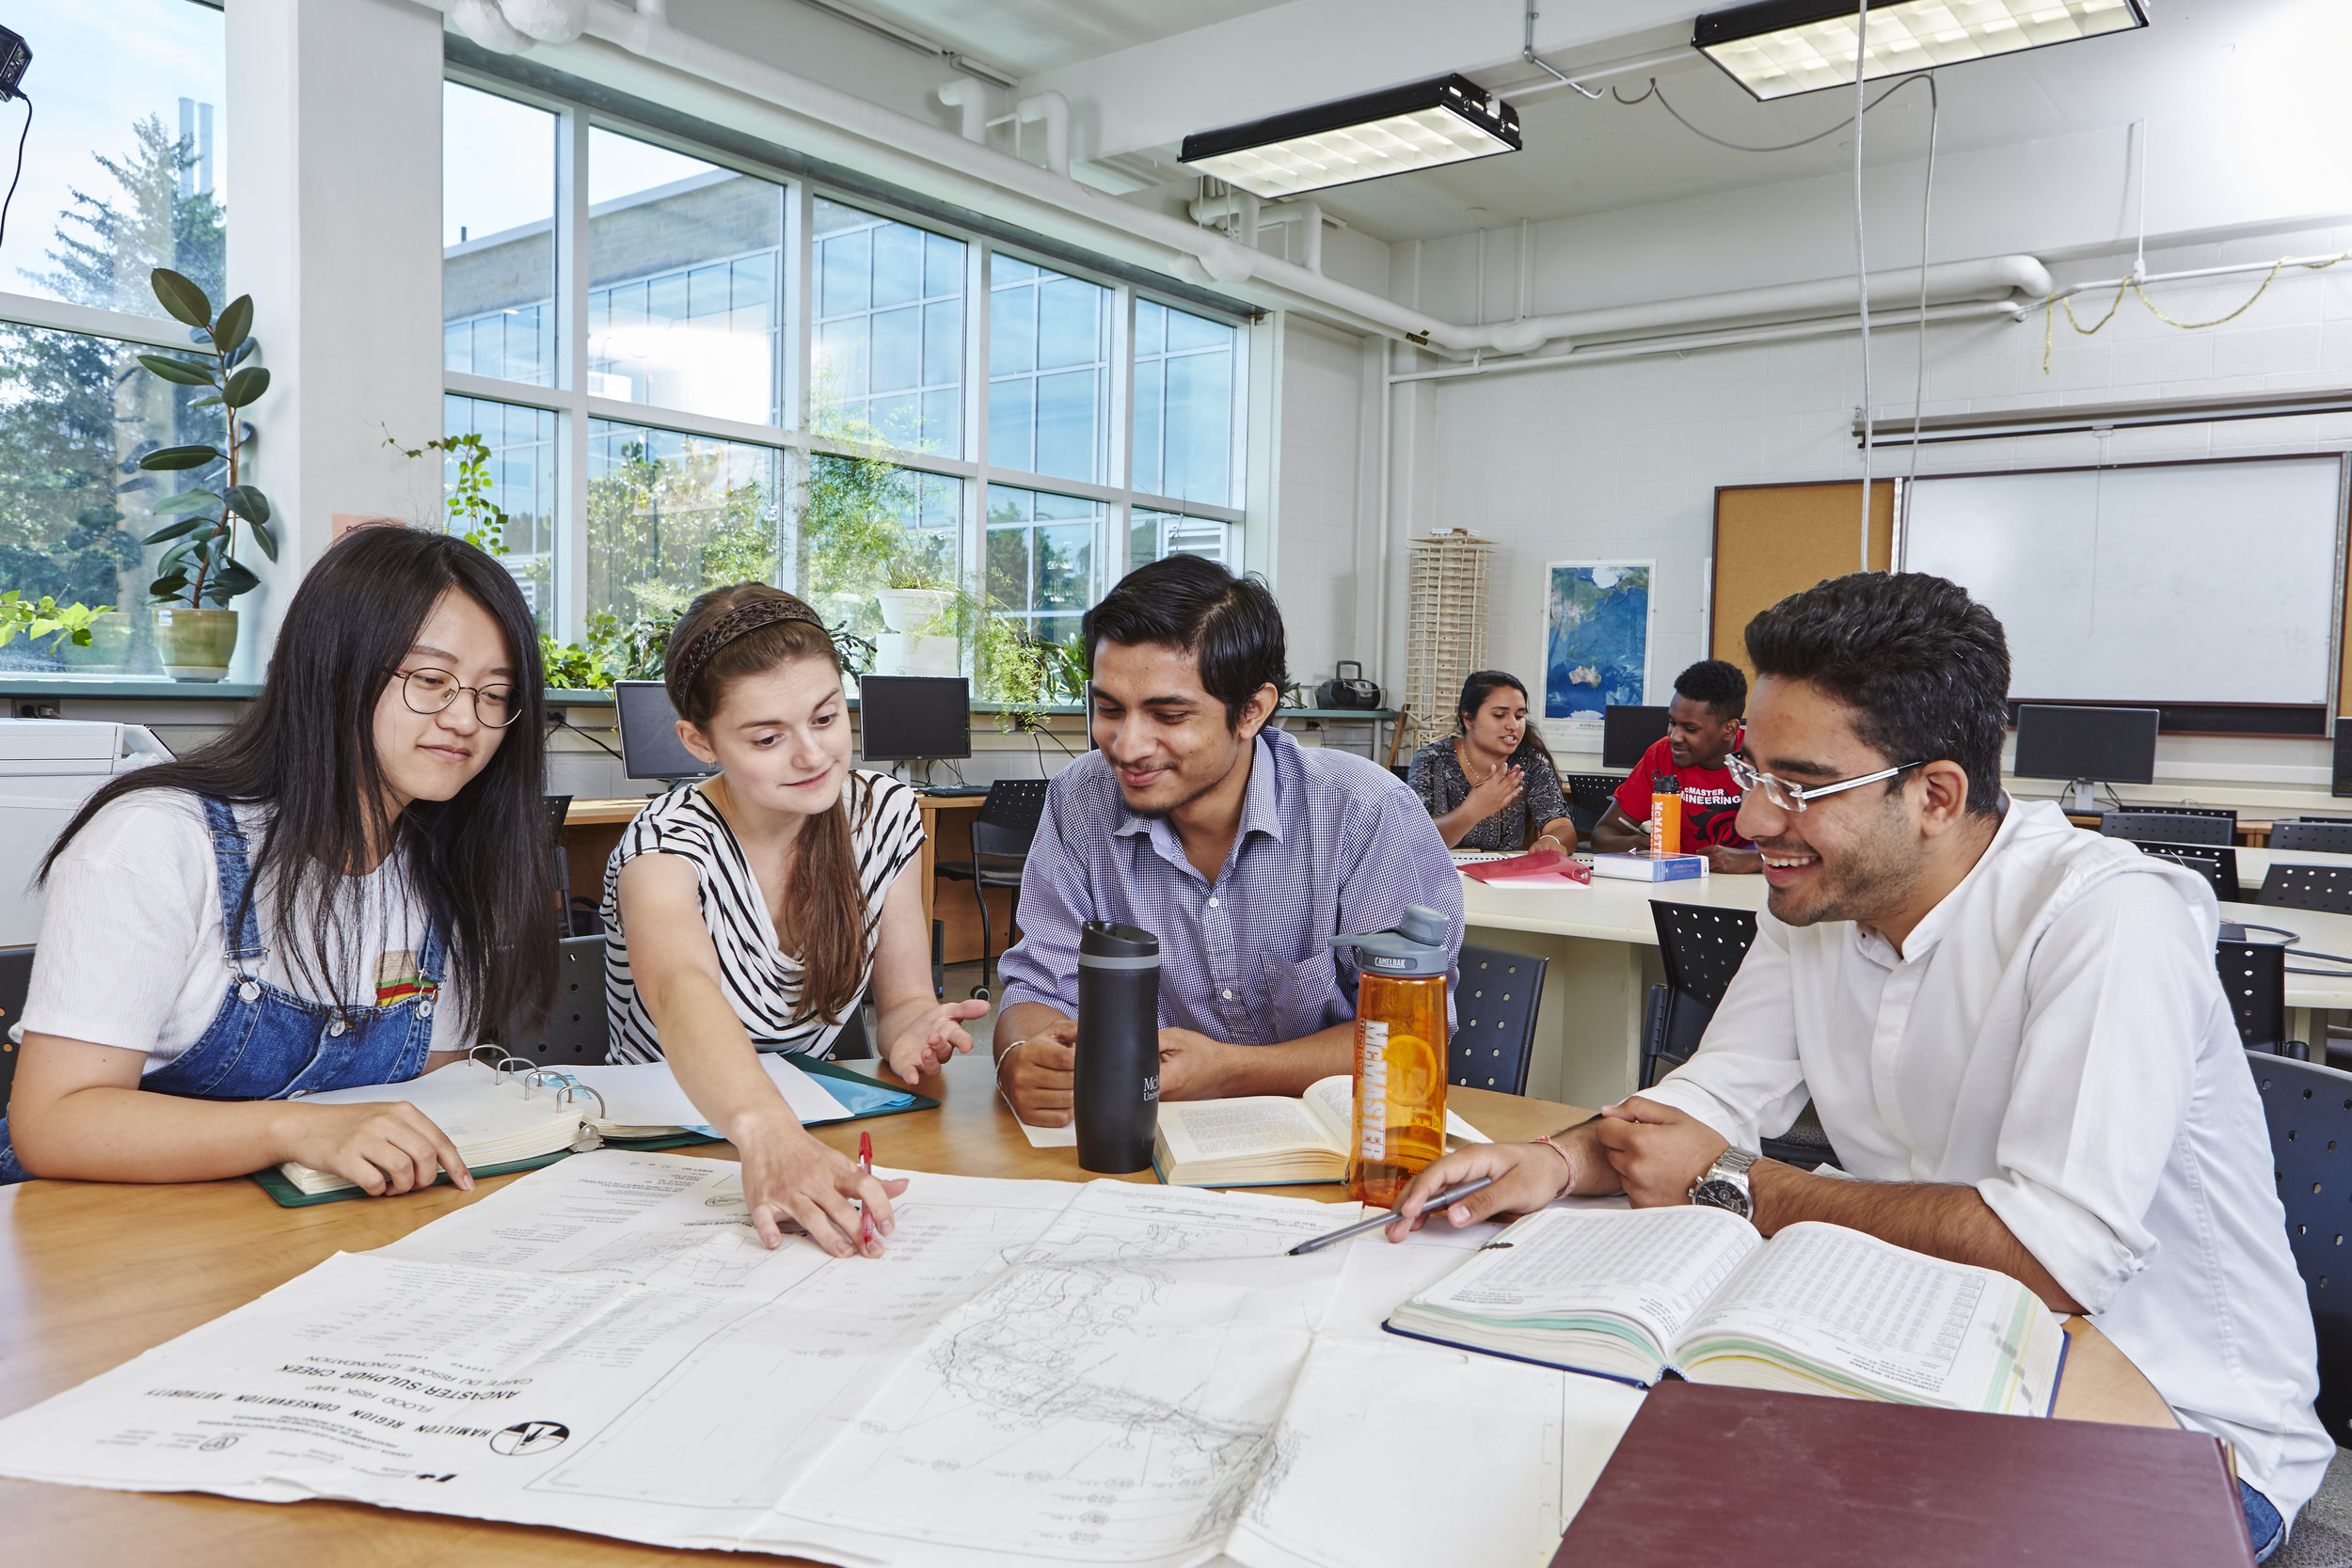 Photo c/o McMaster University Faculty of Engineering